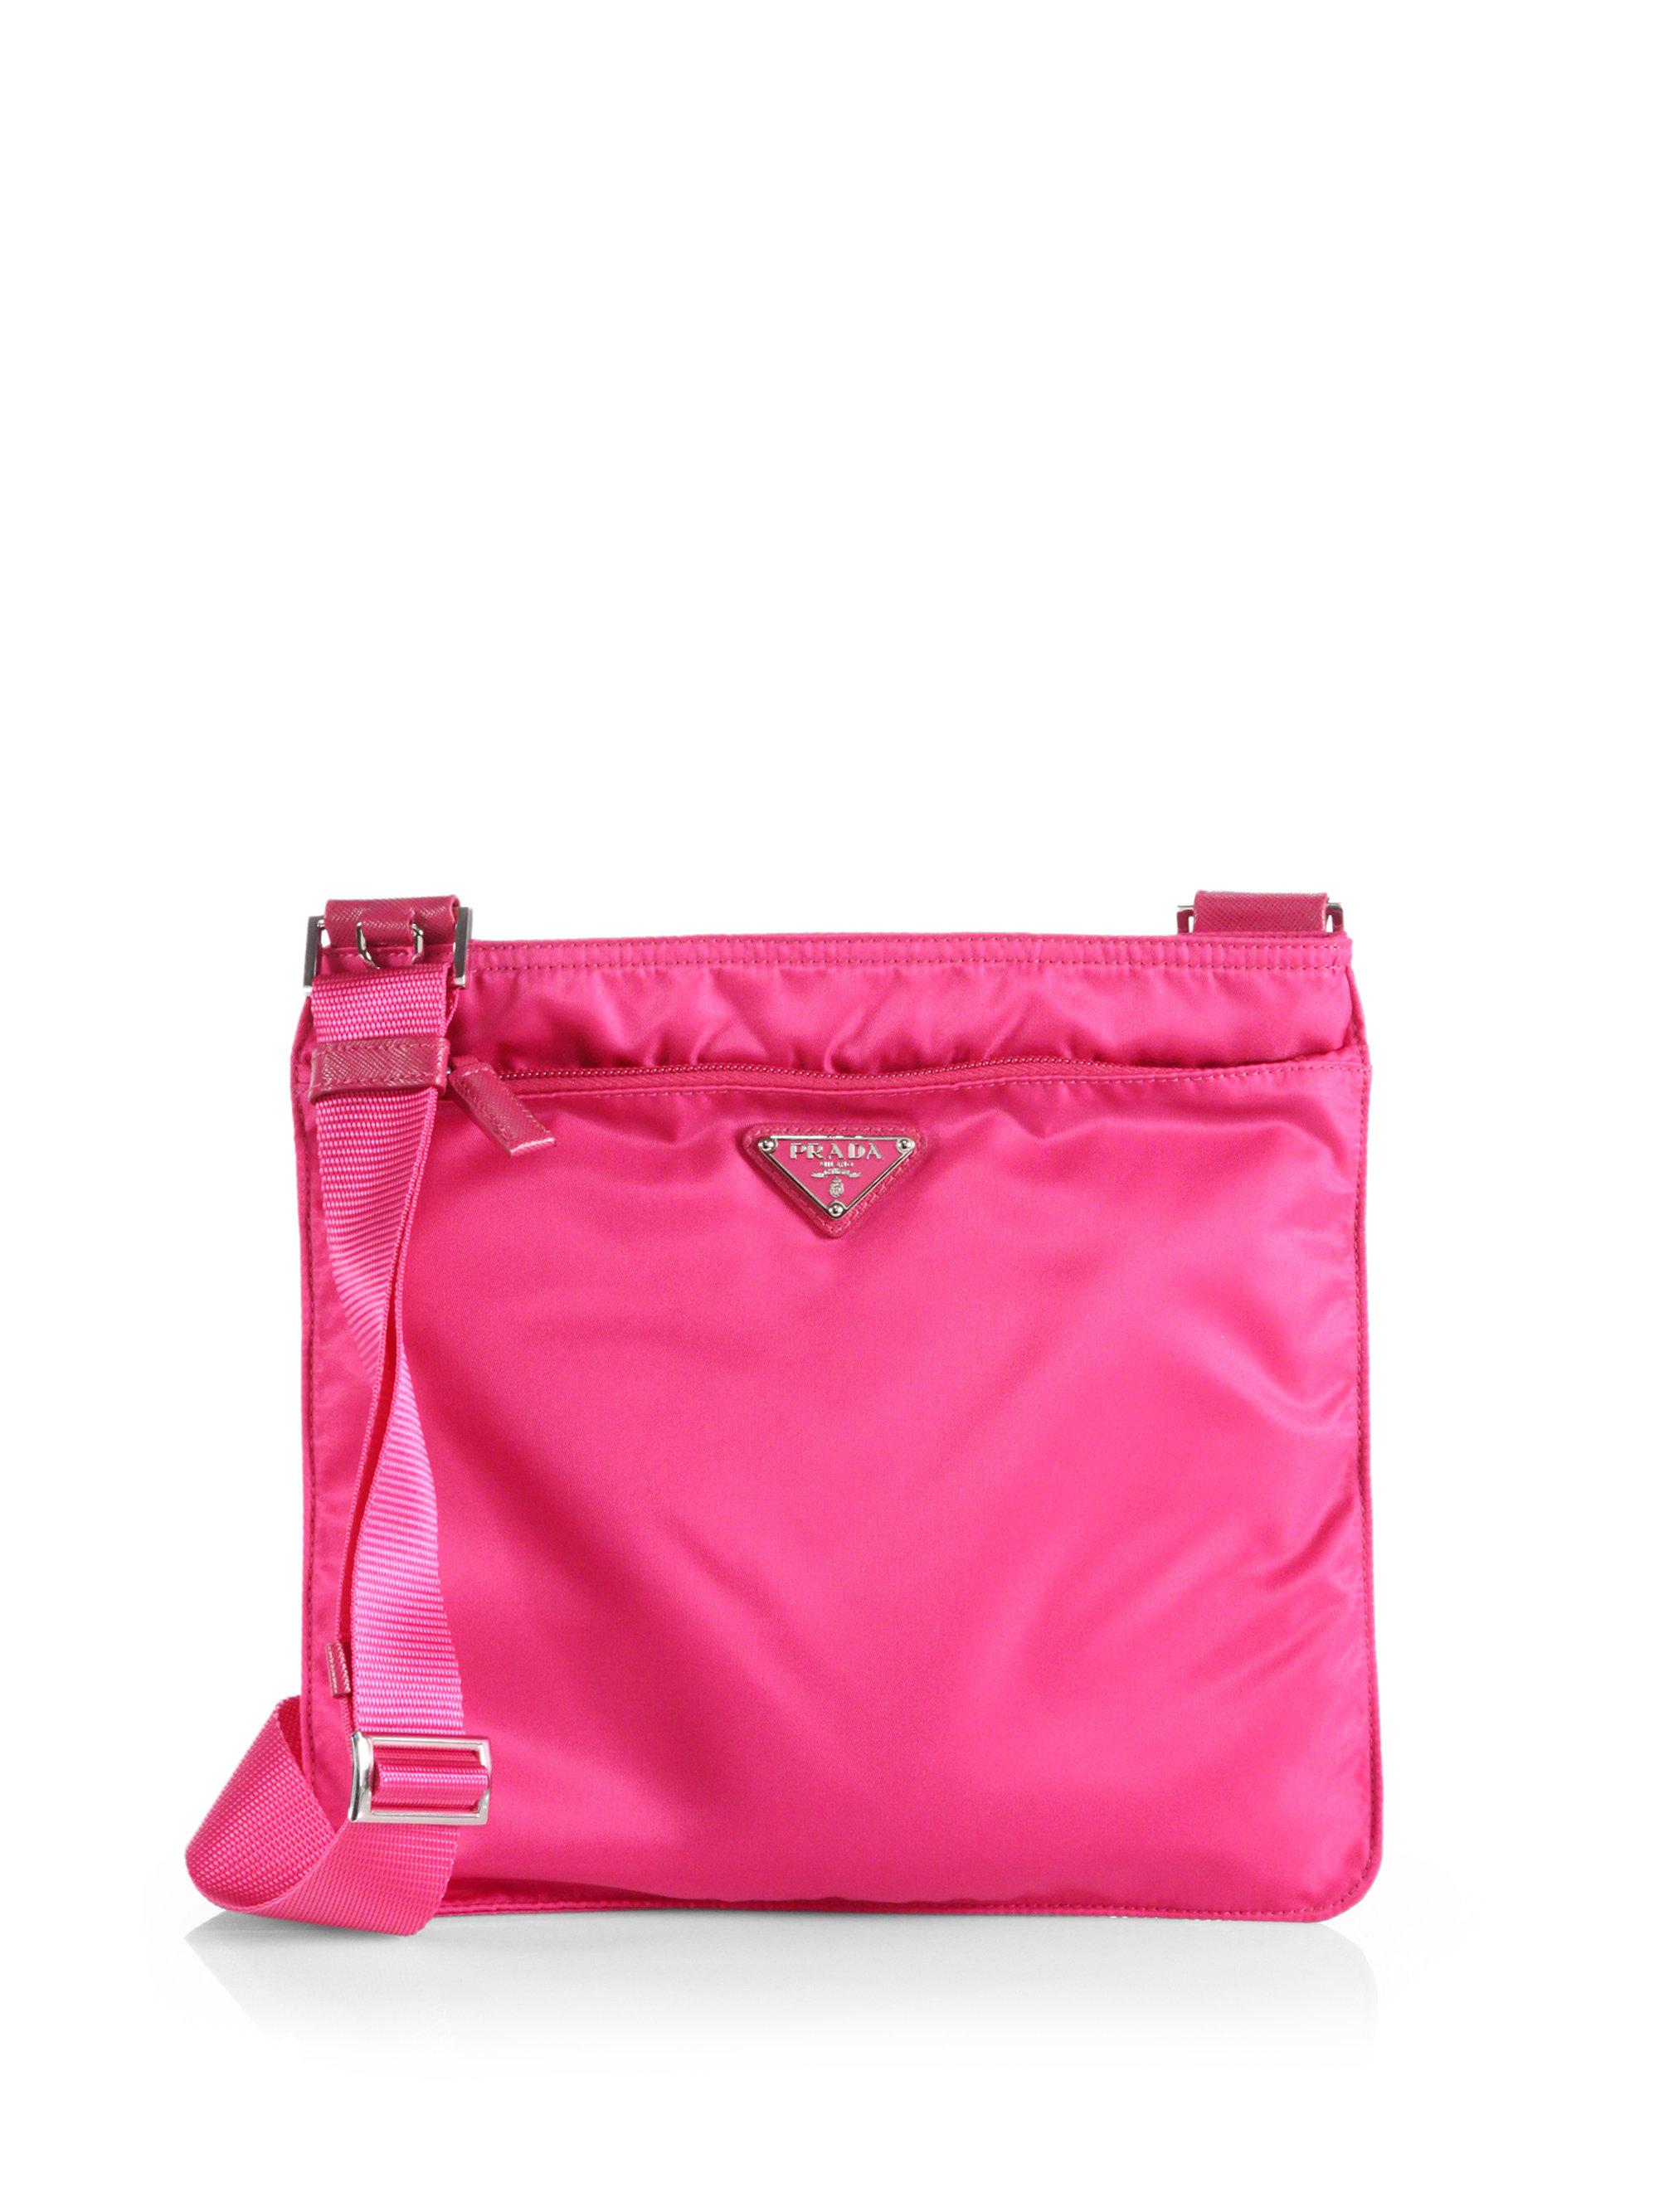 60f9ba56ea525e Prada Vela Crossbody Bag in Pink - Lyst